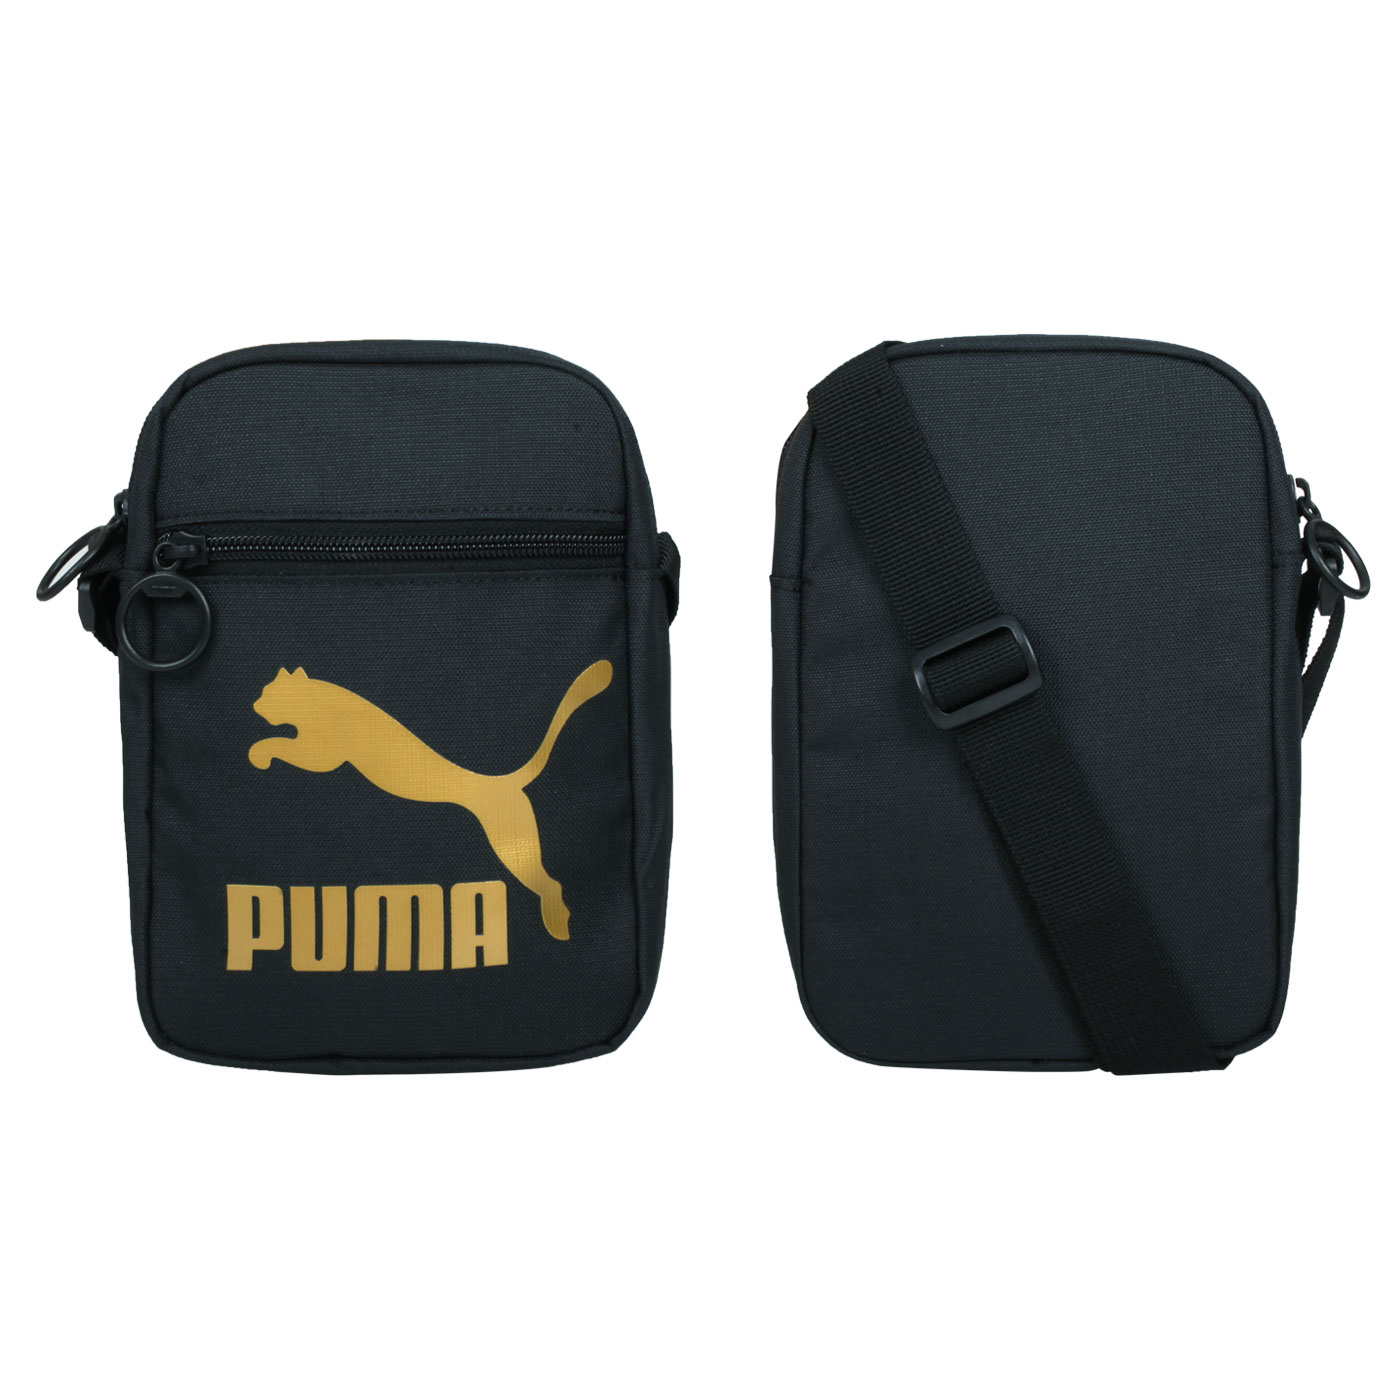 PUMA 小側背包 07800801